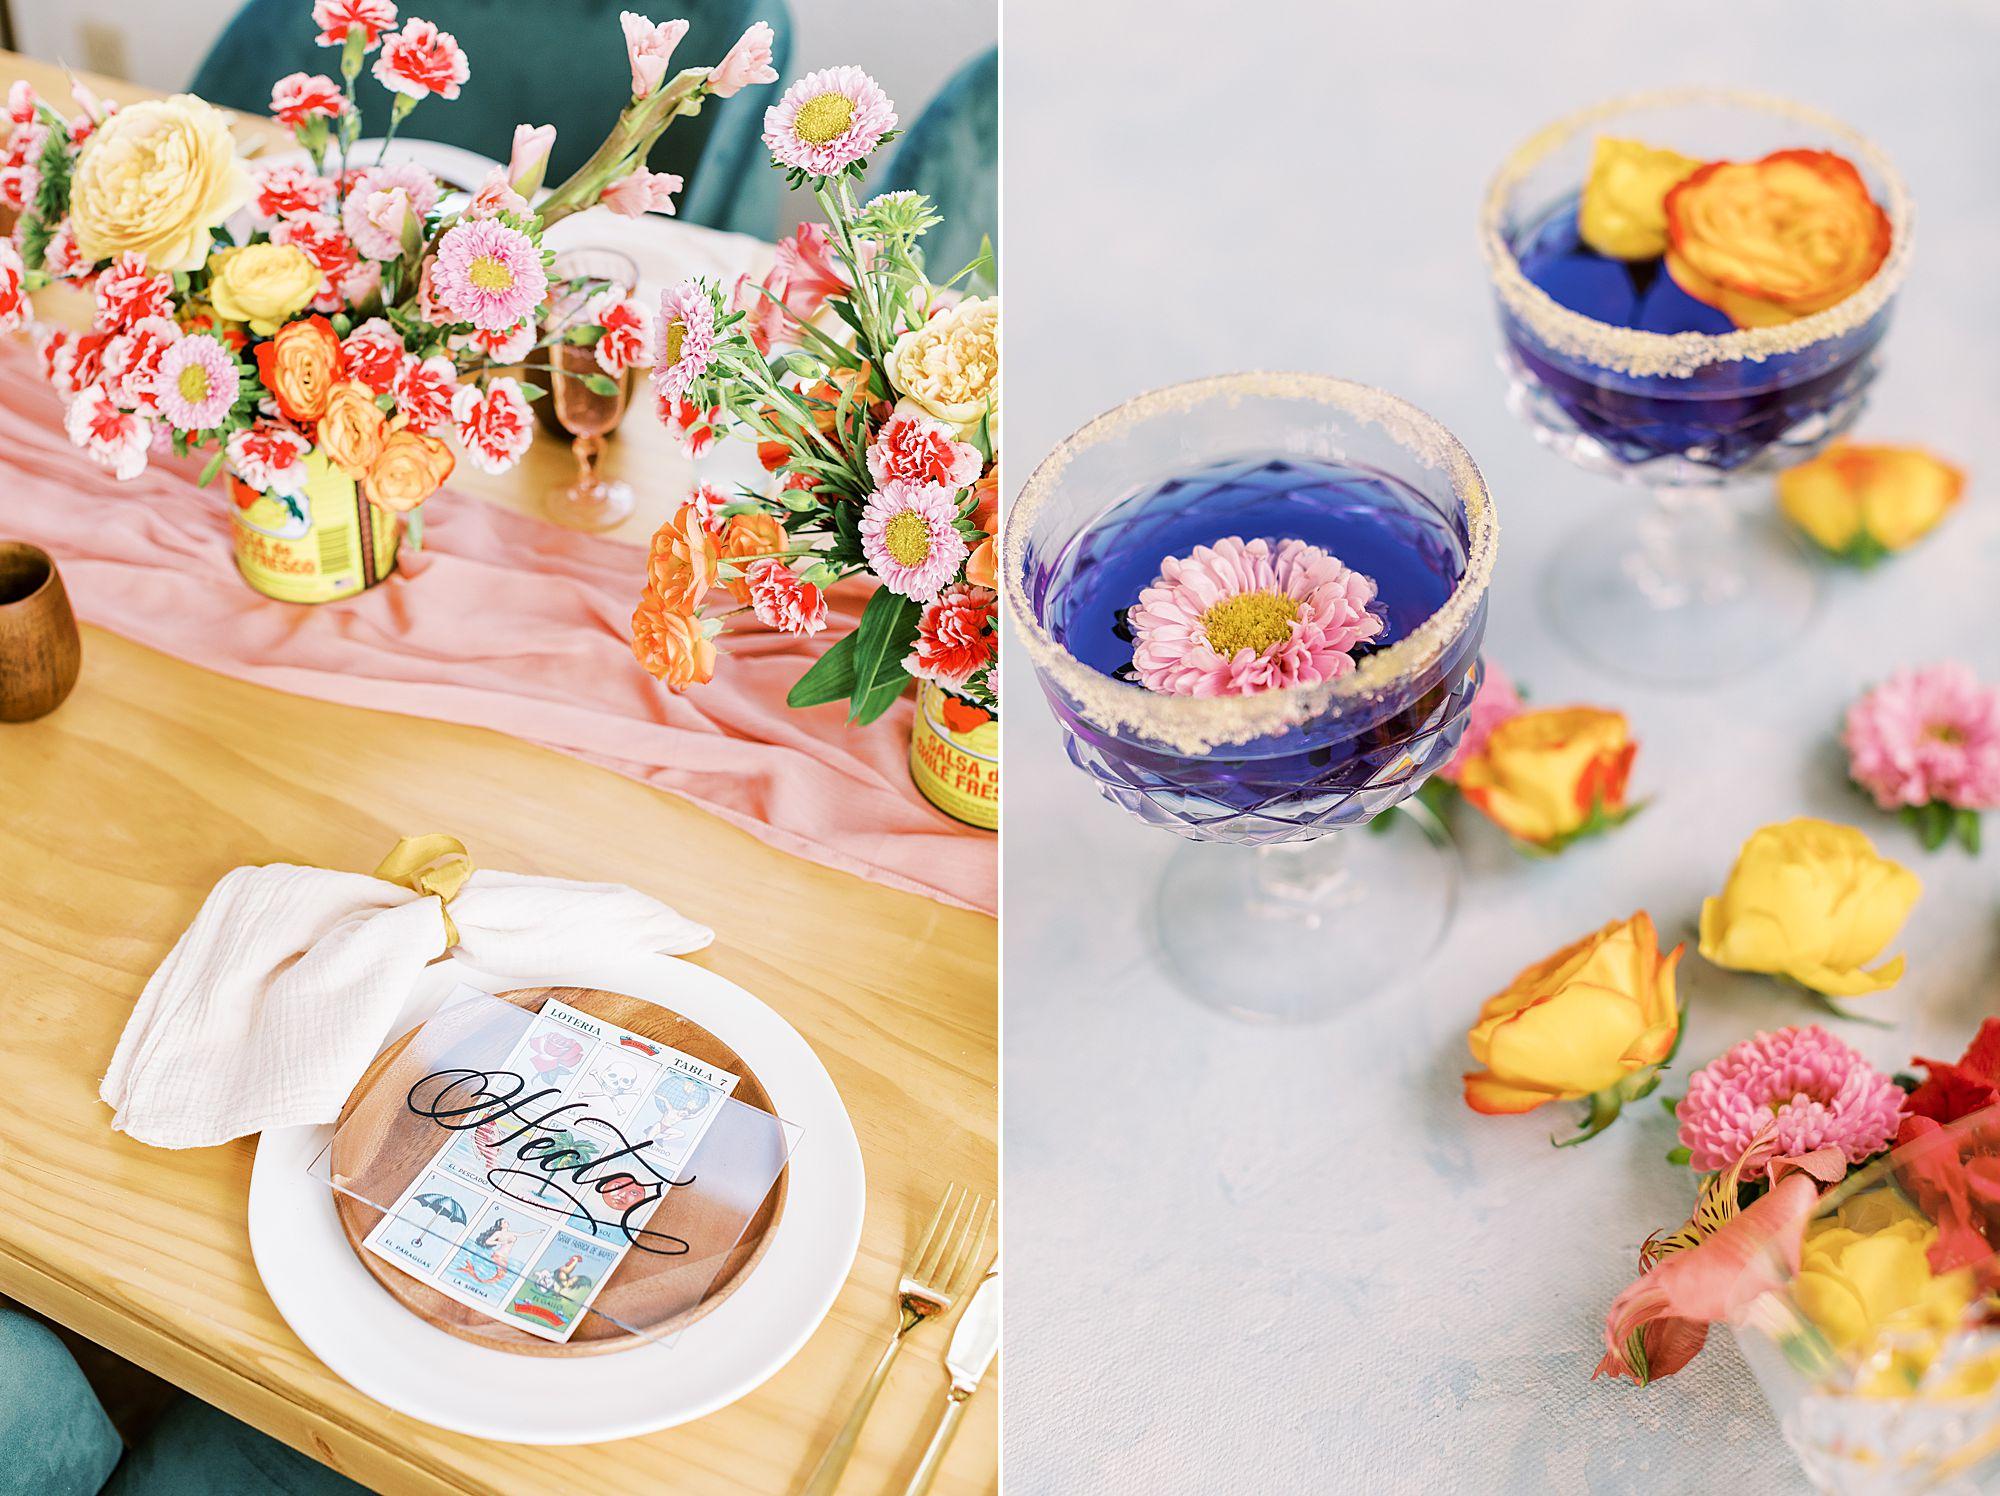 Cinco De Mayo Inspiration for Your FIesta - Party Crush Studio and Ashley Baumgartner_0006.jpg